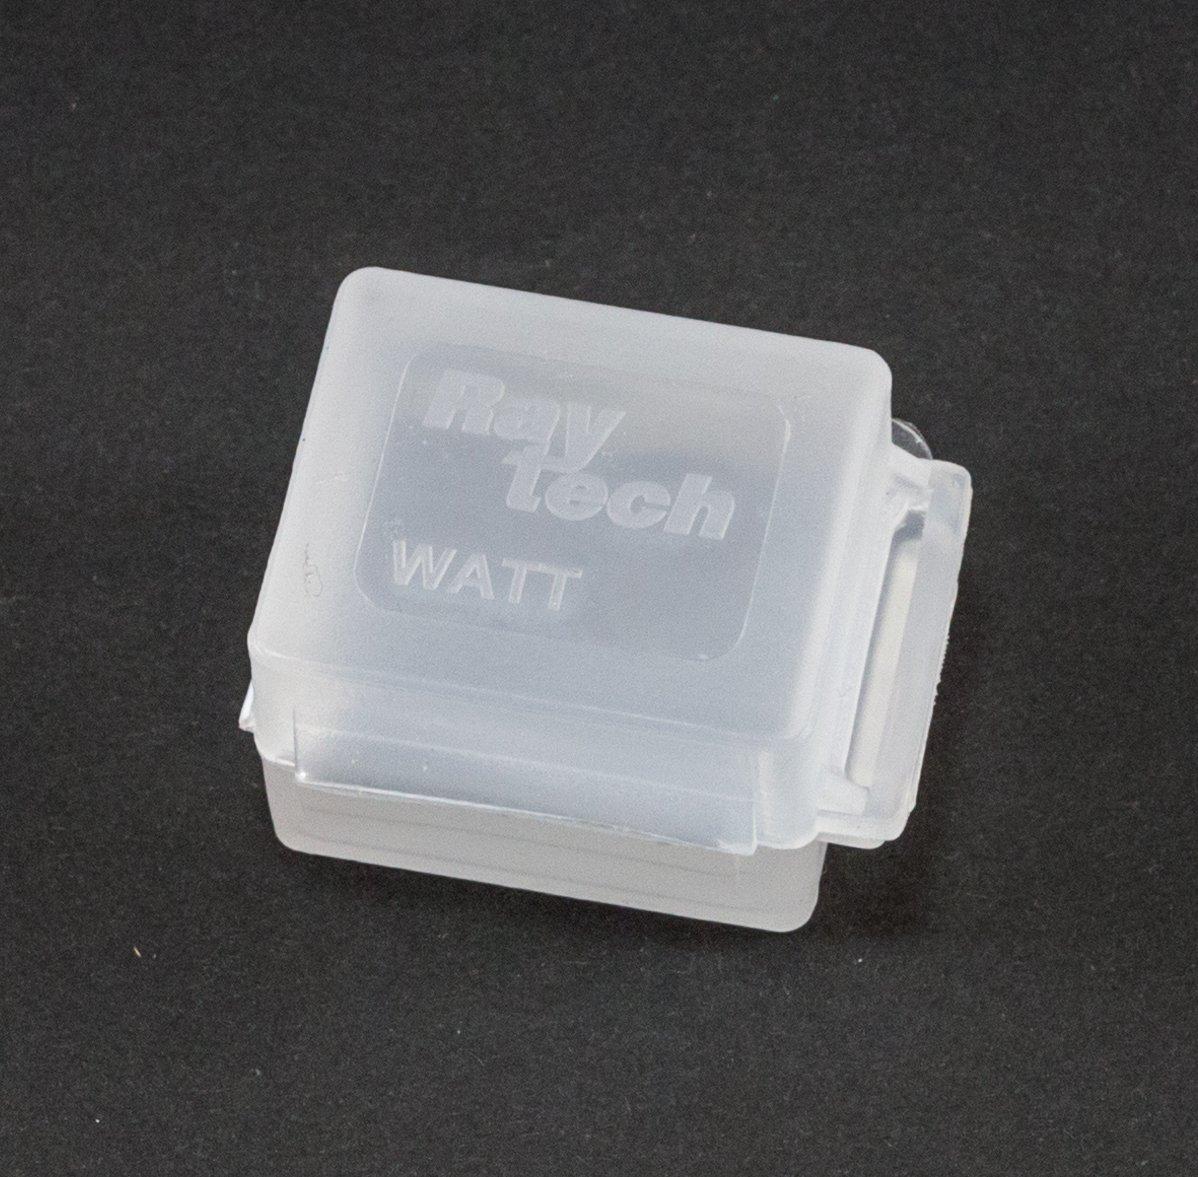 Raytech Gel Box Watt 30 x 38 x 26 (Lot de 1)